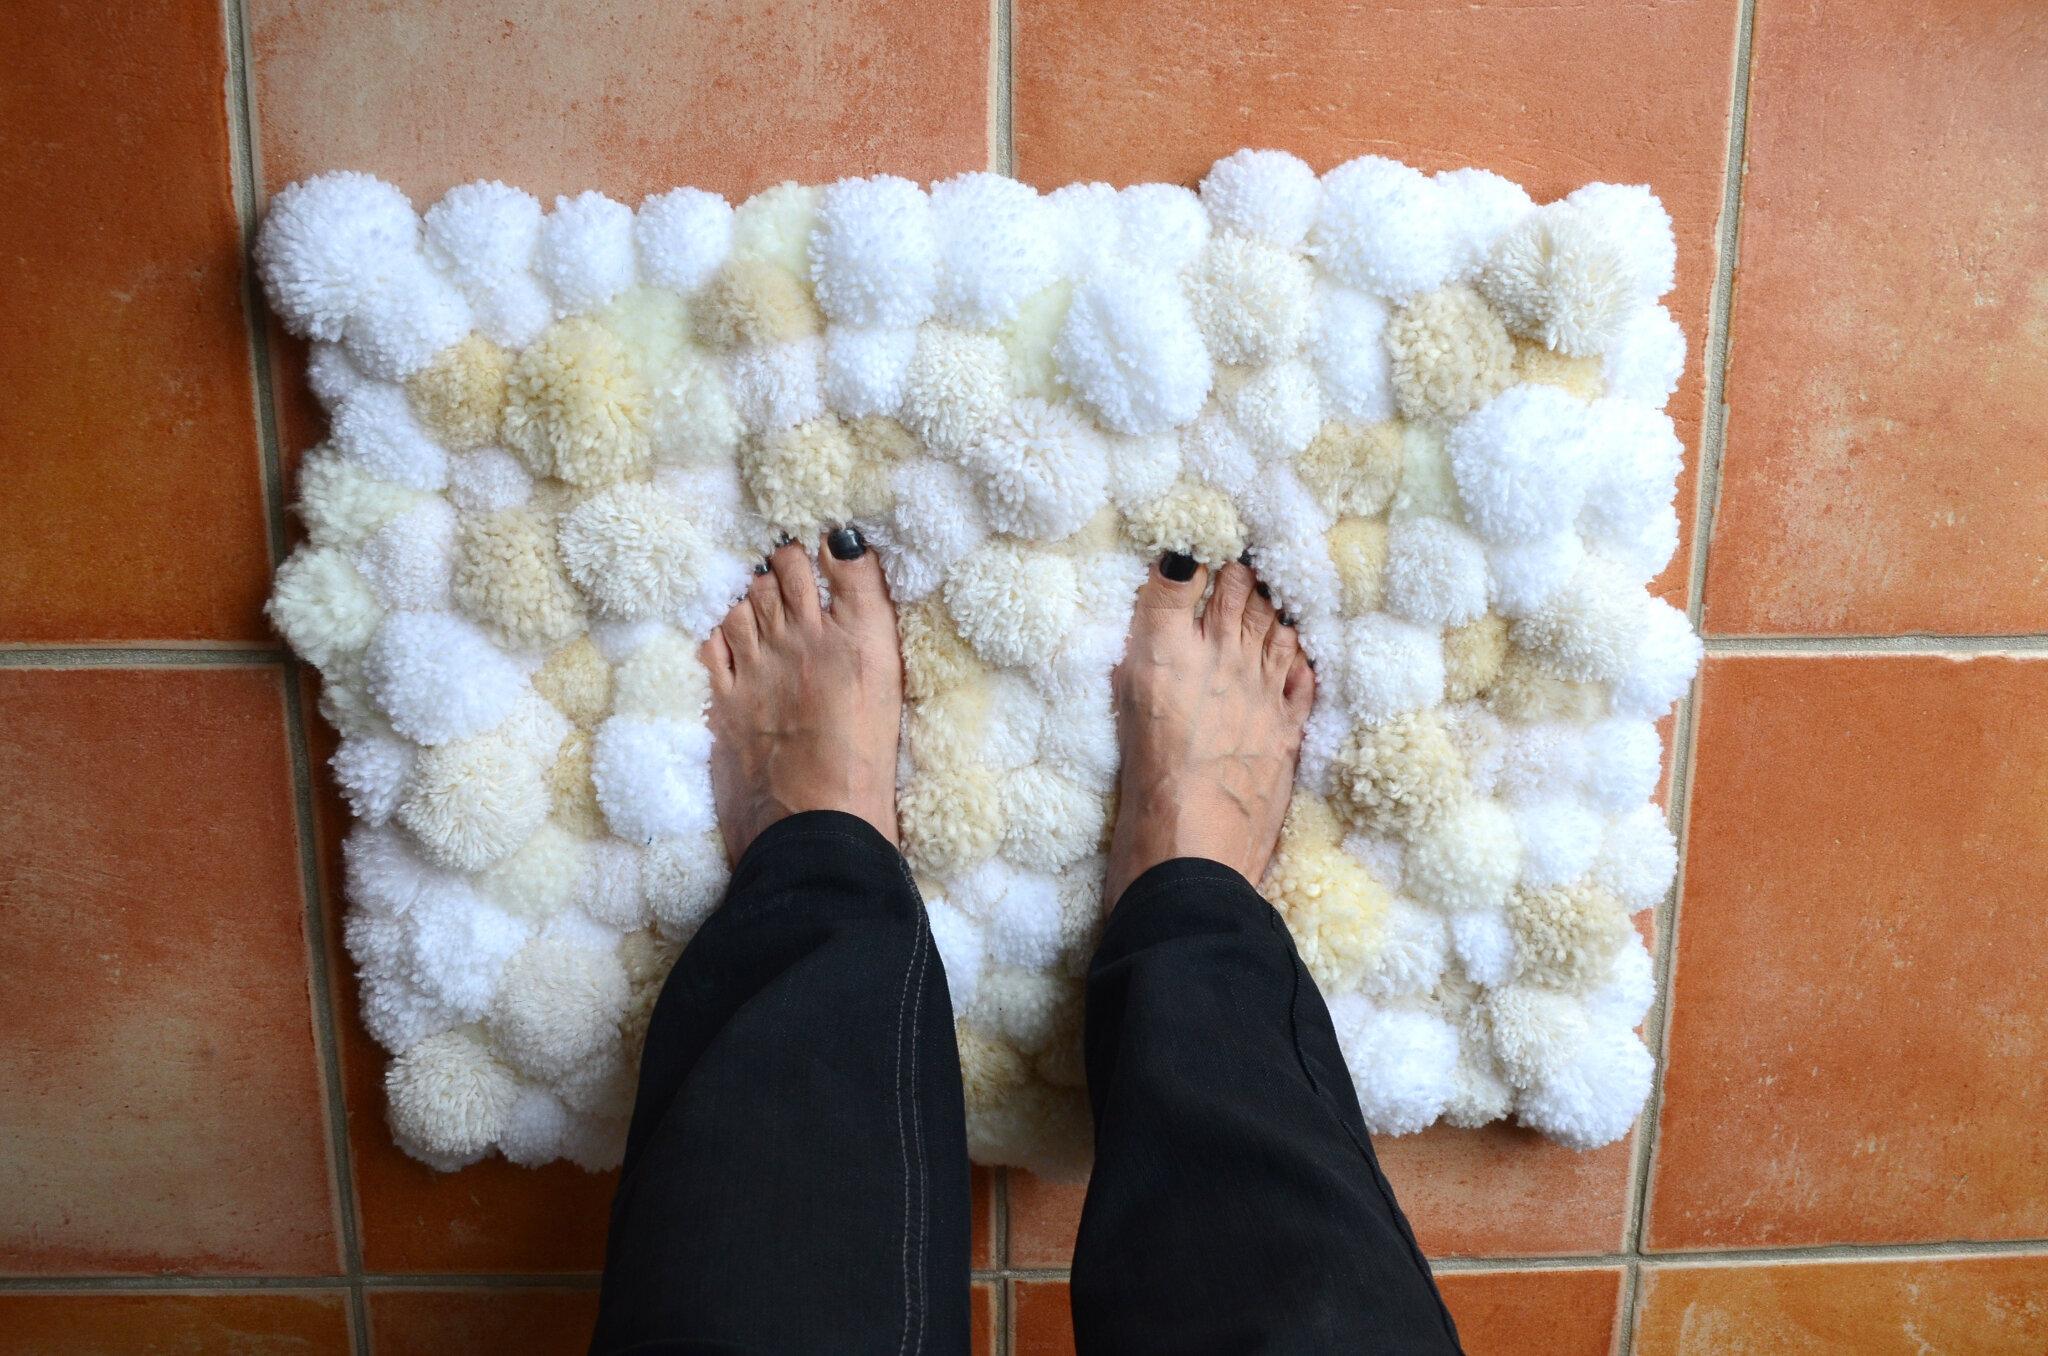 fabrication de pompon en laine fashion designs. Black Bedroom Furniture Sets. Home Design Ideas